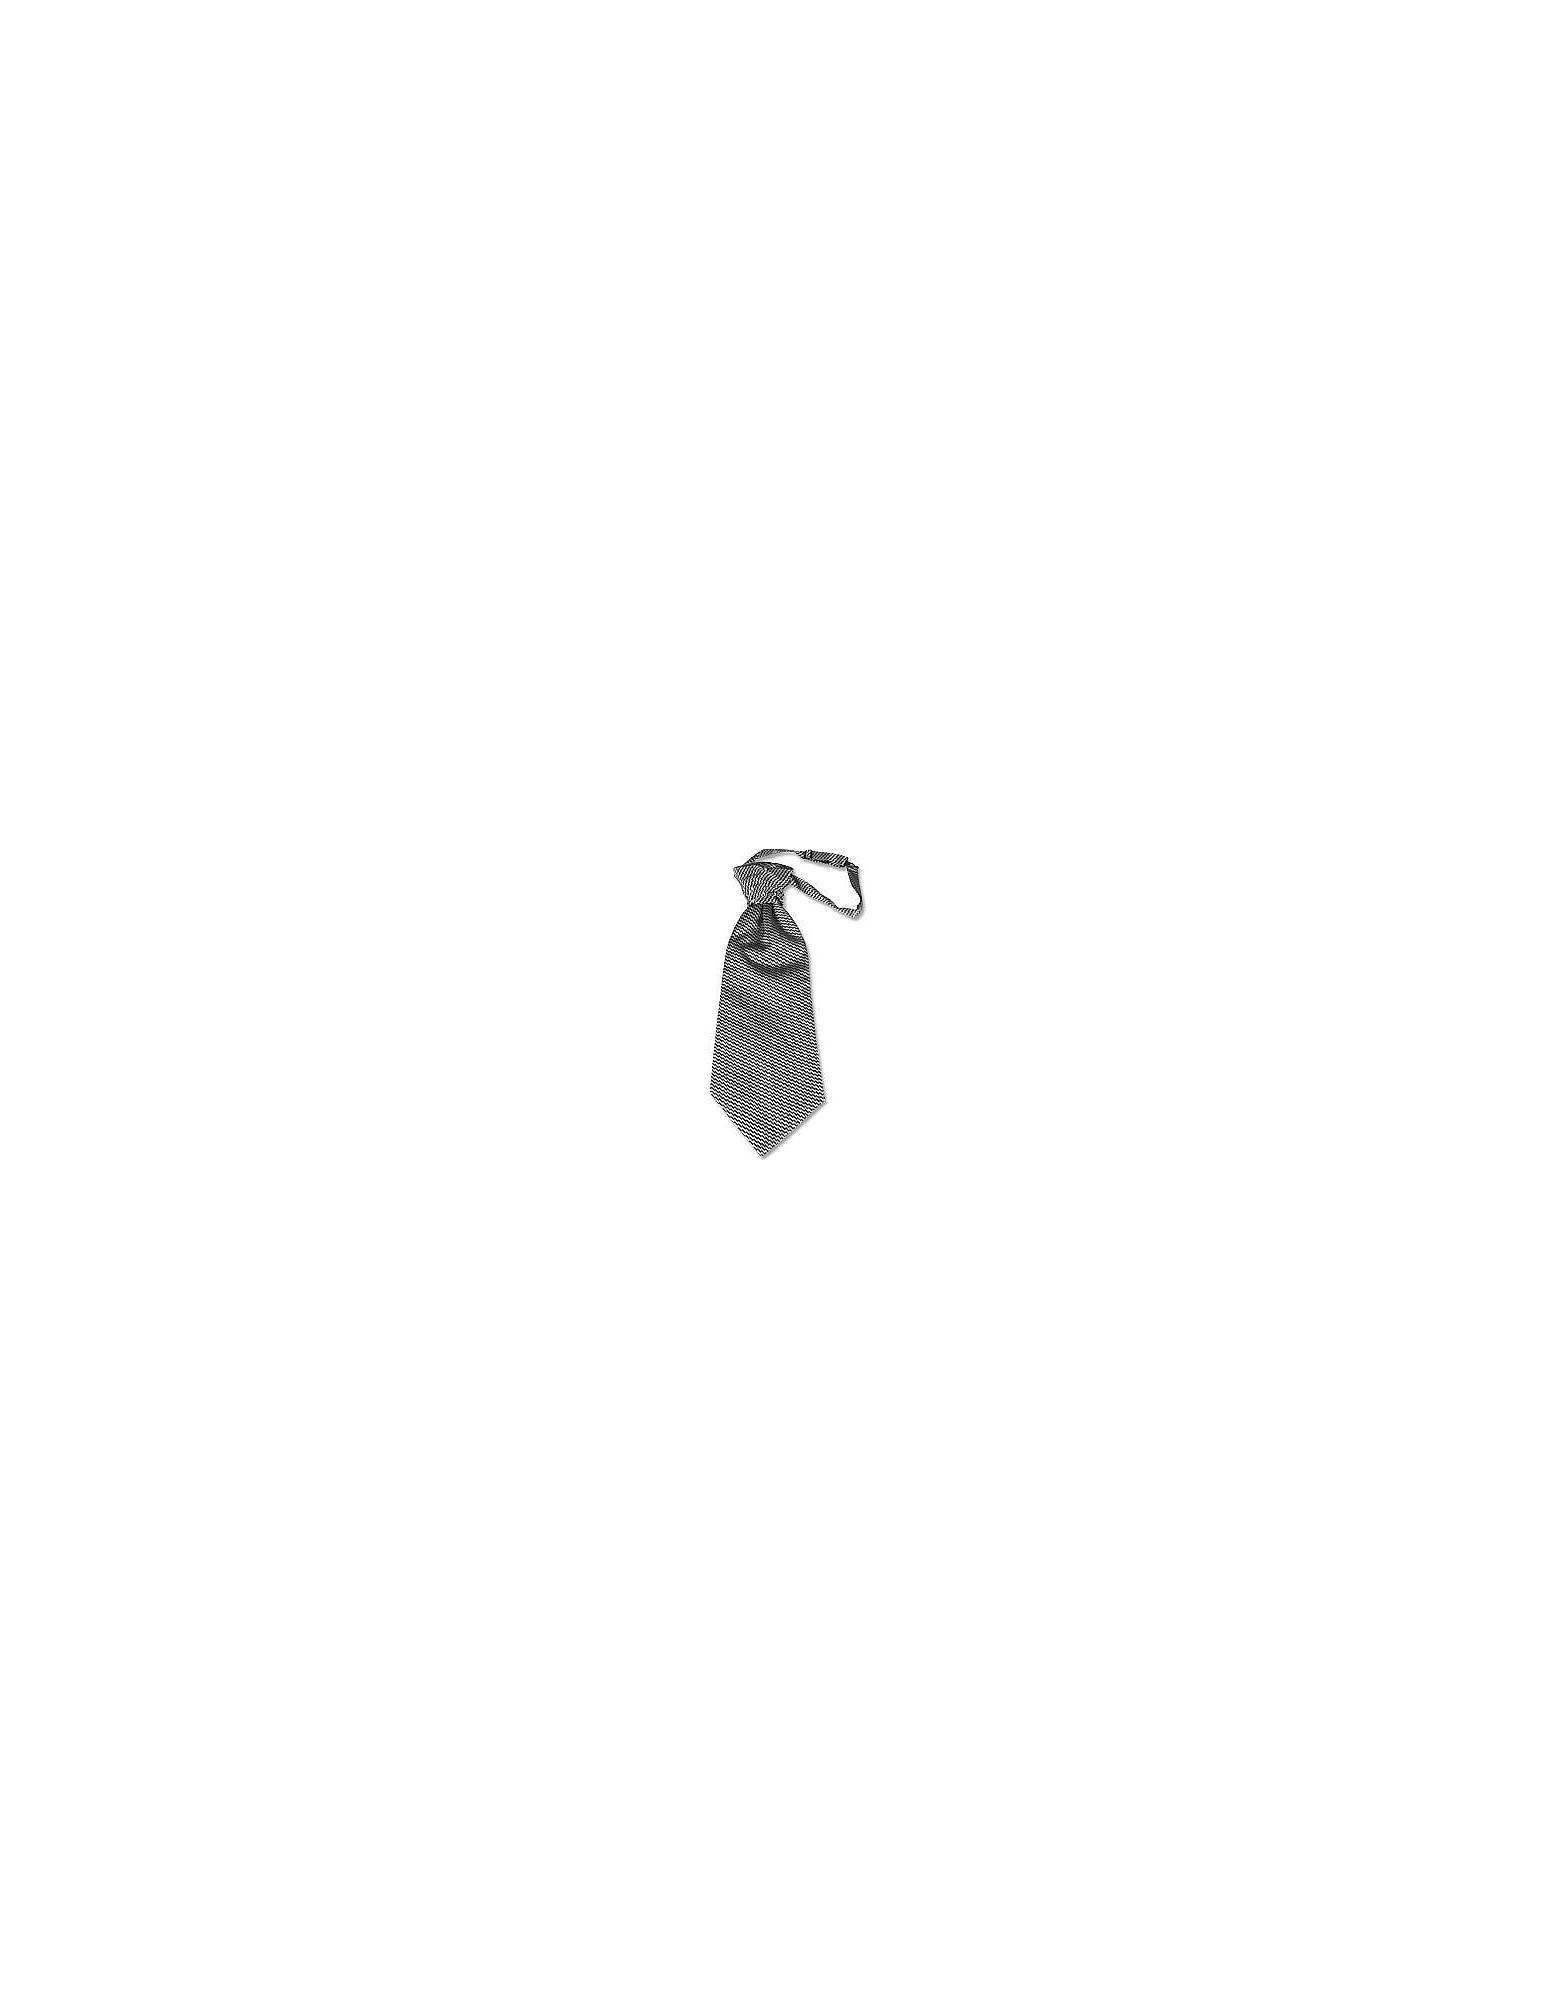 Forzieri Bowties and Cummerbunds, Silver Mono Tail Plastron